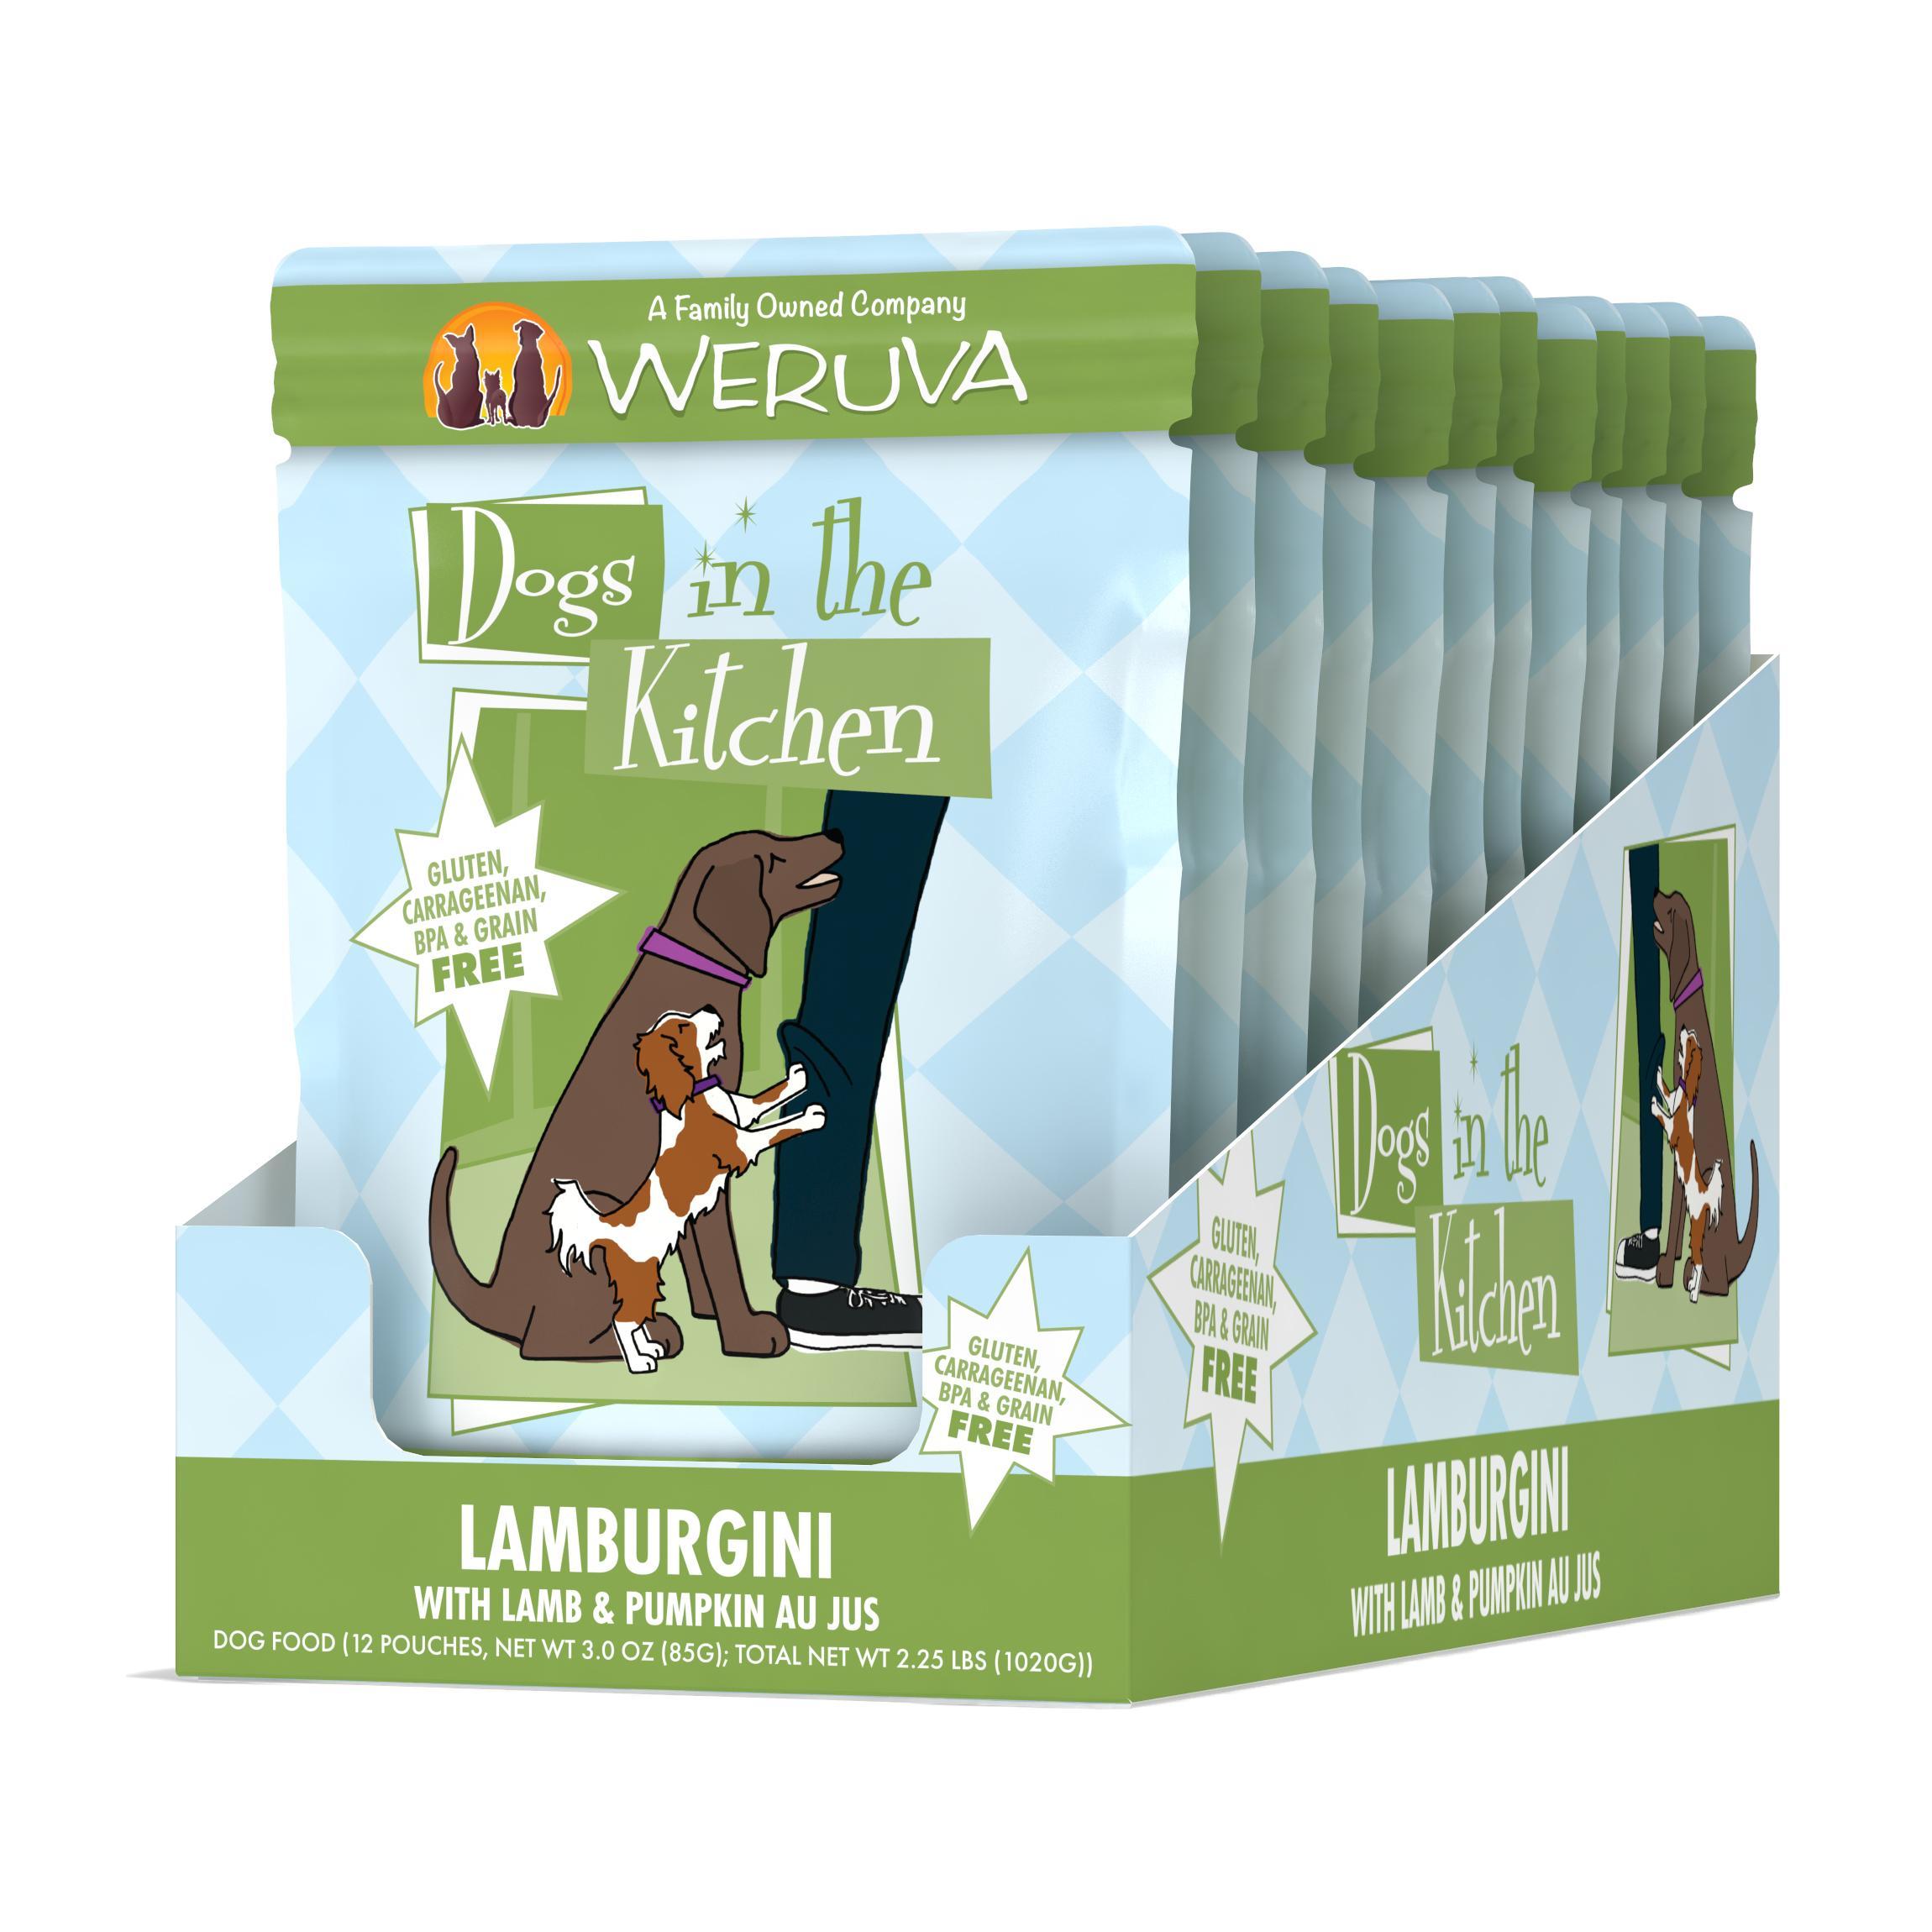 Weruva Dogs in the Kitchen Lamburgini with Lamb & Pumpkin Au Jus Grain-Free Wet Dog Food, 2.8-oz, case of 12